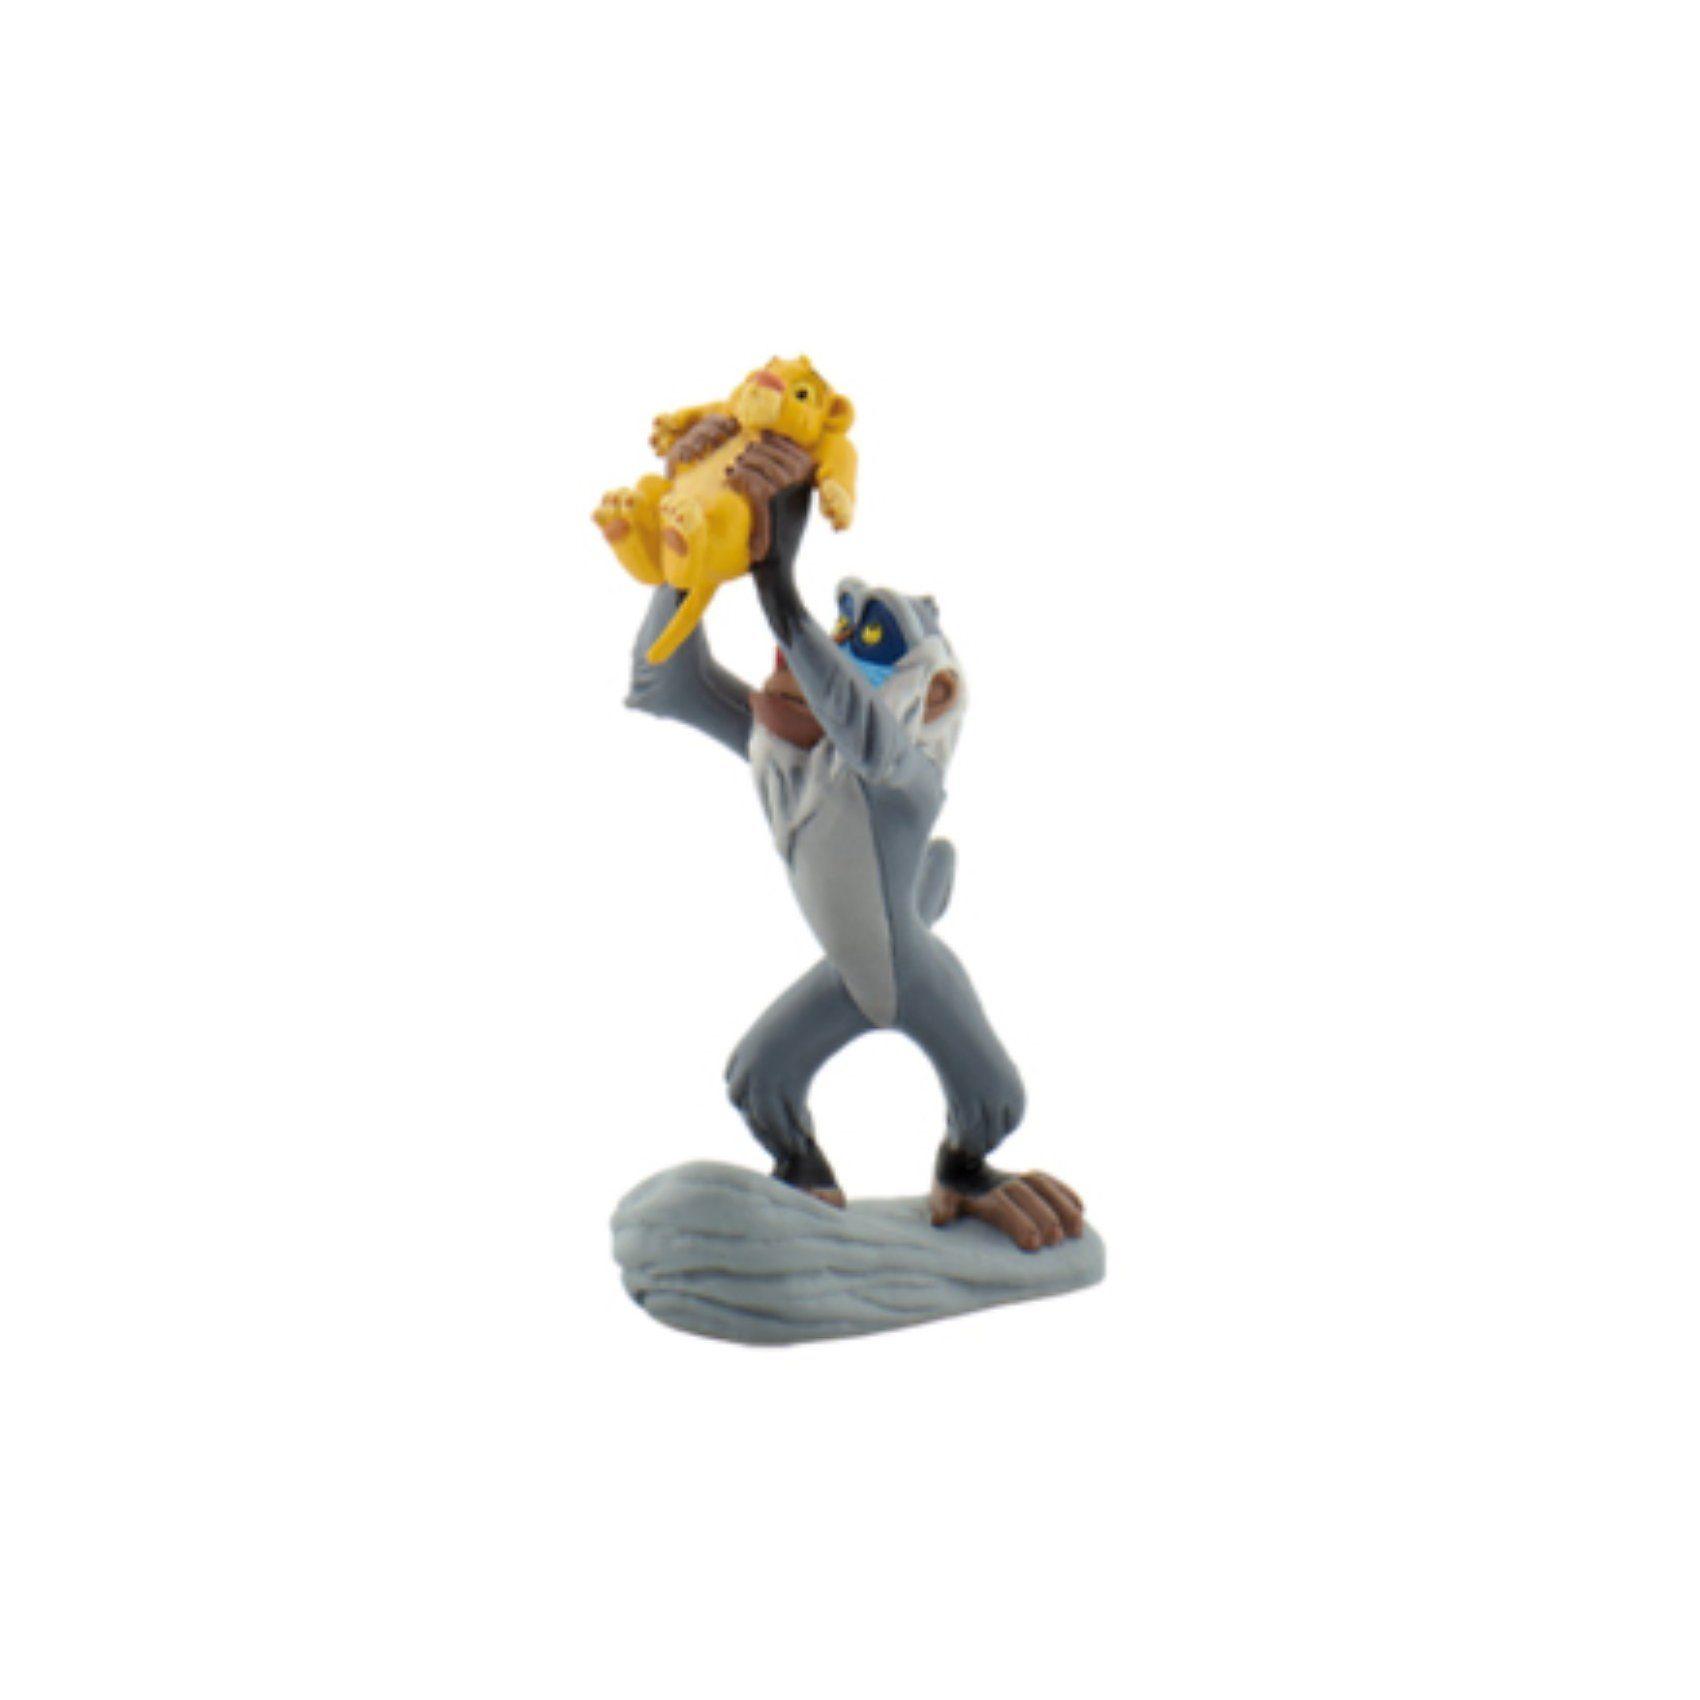 BULLYLAND Comicwelt Walt Disney König der Löwen - Spielfigur Rafiki mi